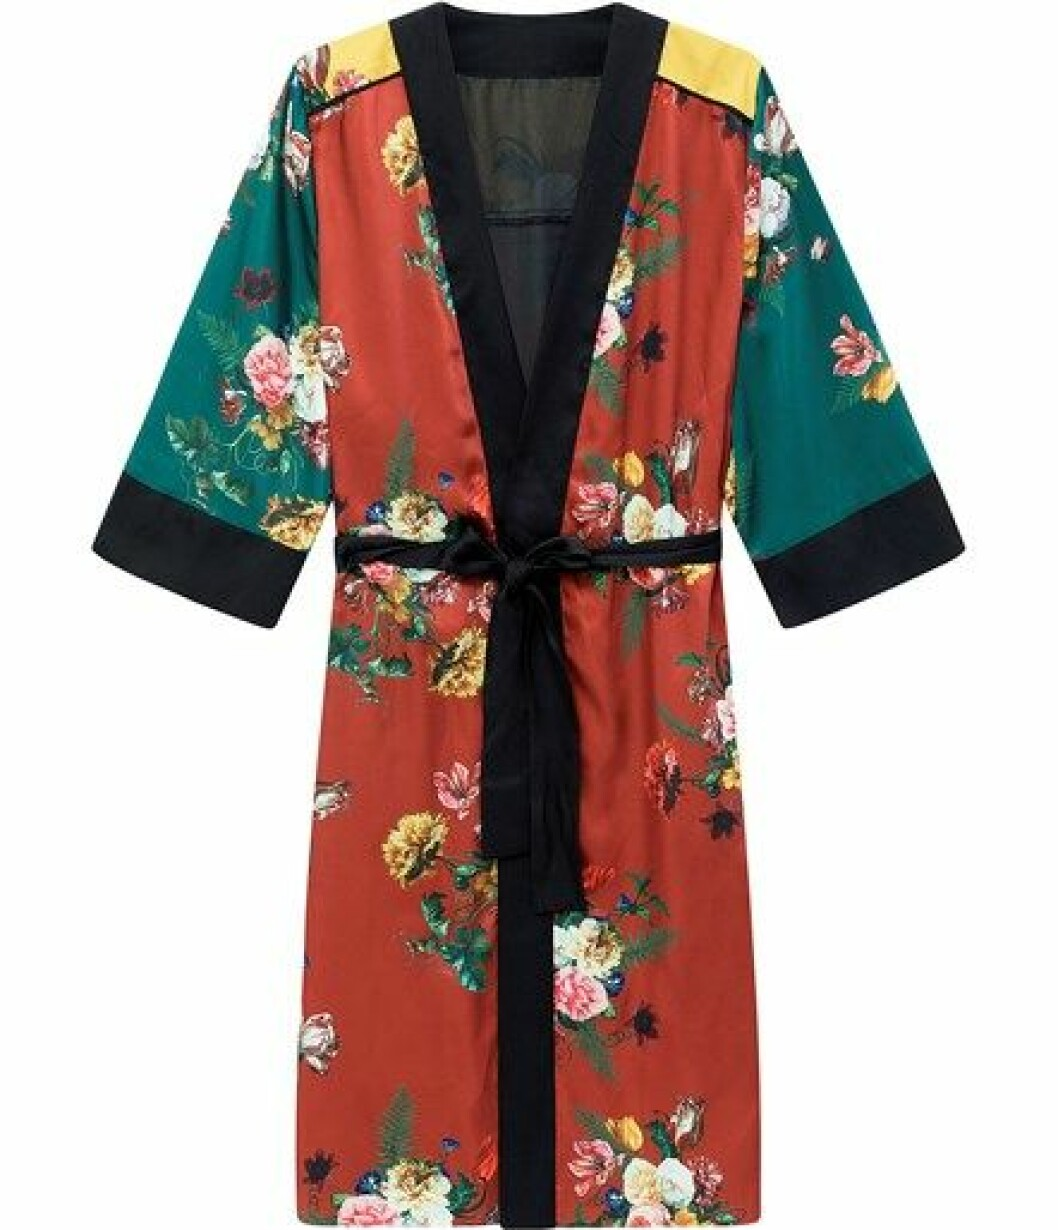 Kimono fra Kappahl  500,-  https://www.kappahl.com/nn-no/dame/kimono/blomstrete-kimono/528729